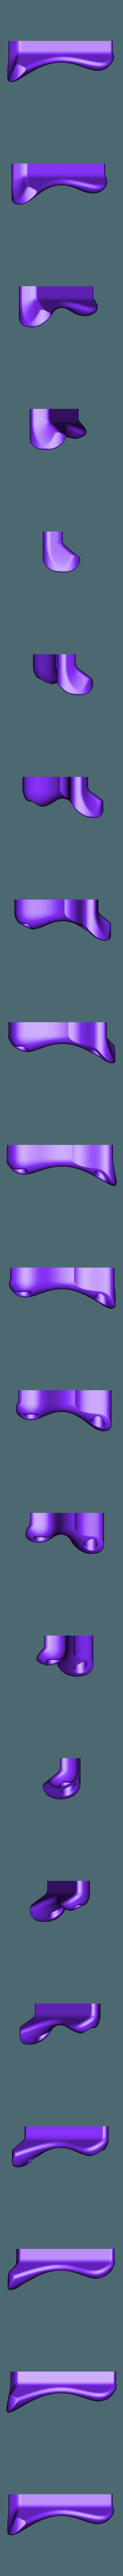 Pierre_4.stl Download free STL file Rock for Climbing Wall • 3D printing design, Zekazz